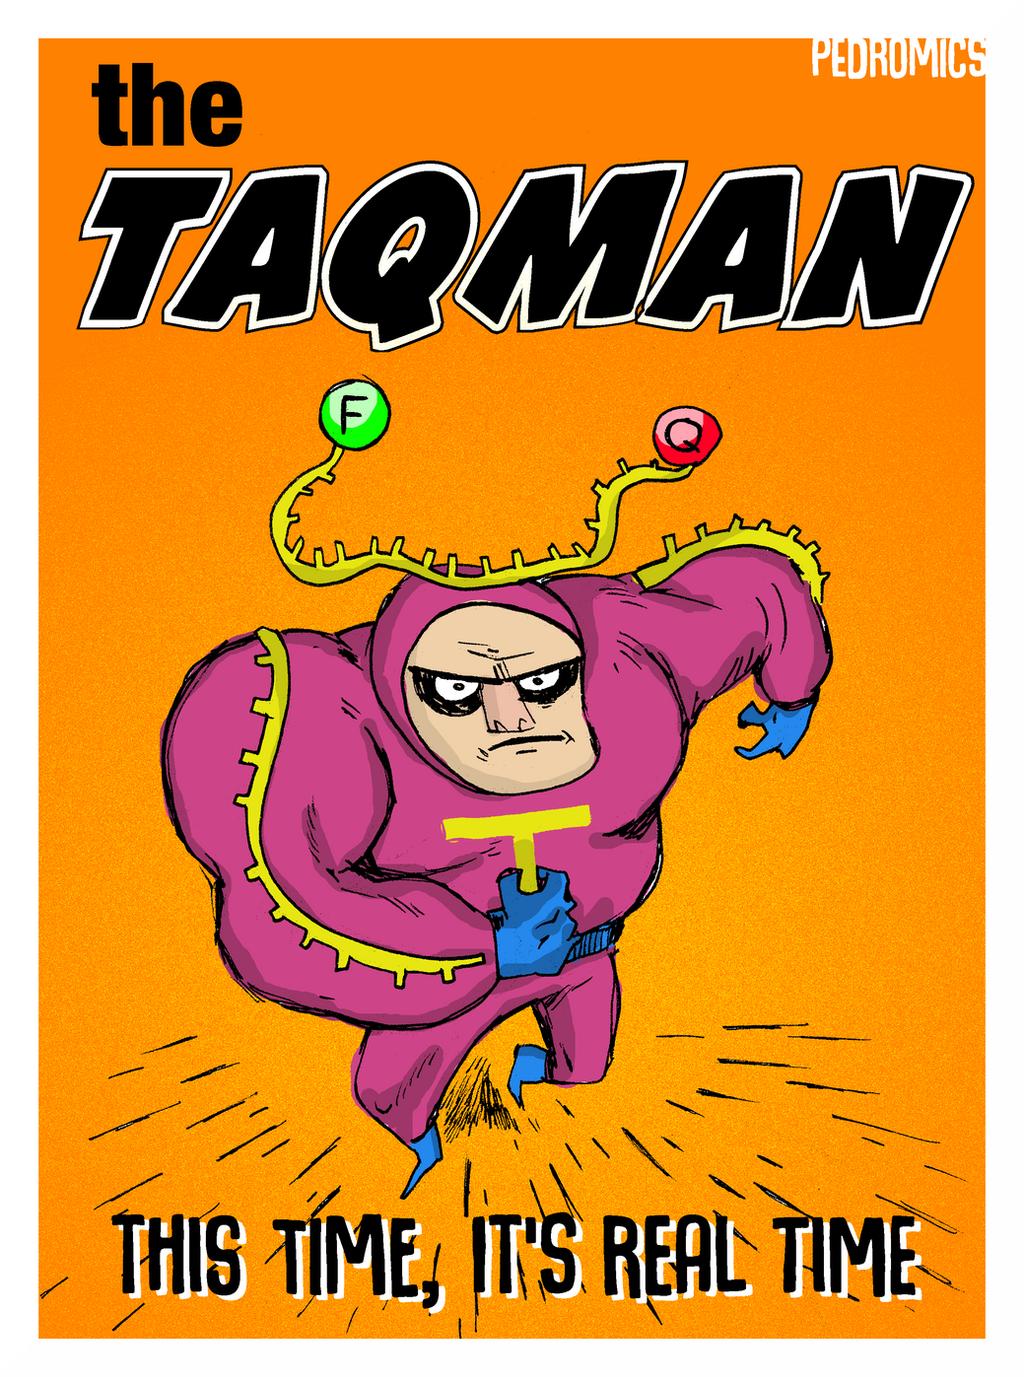 Taqman by Velica